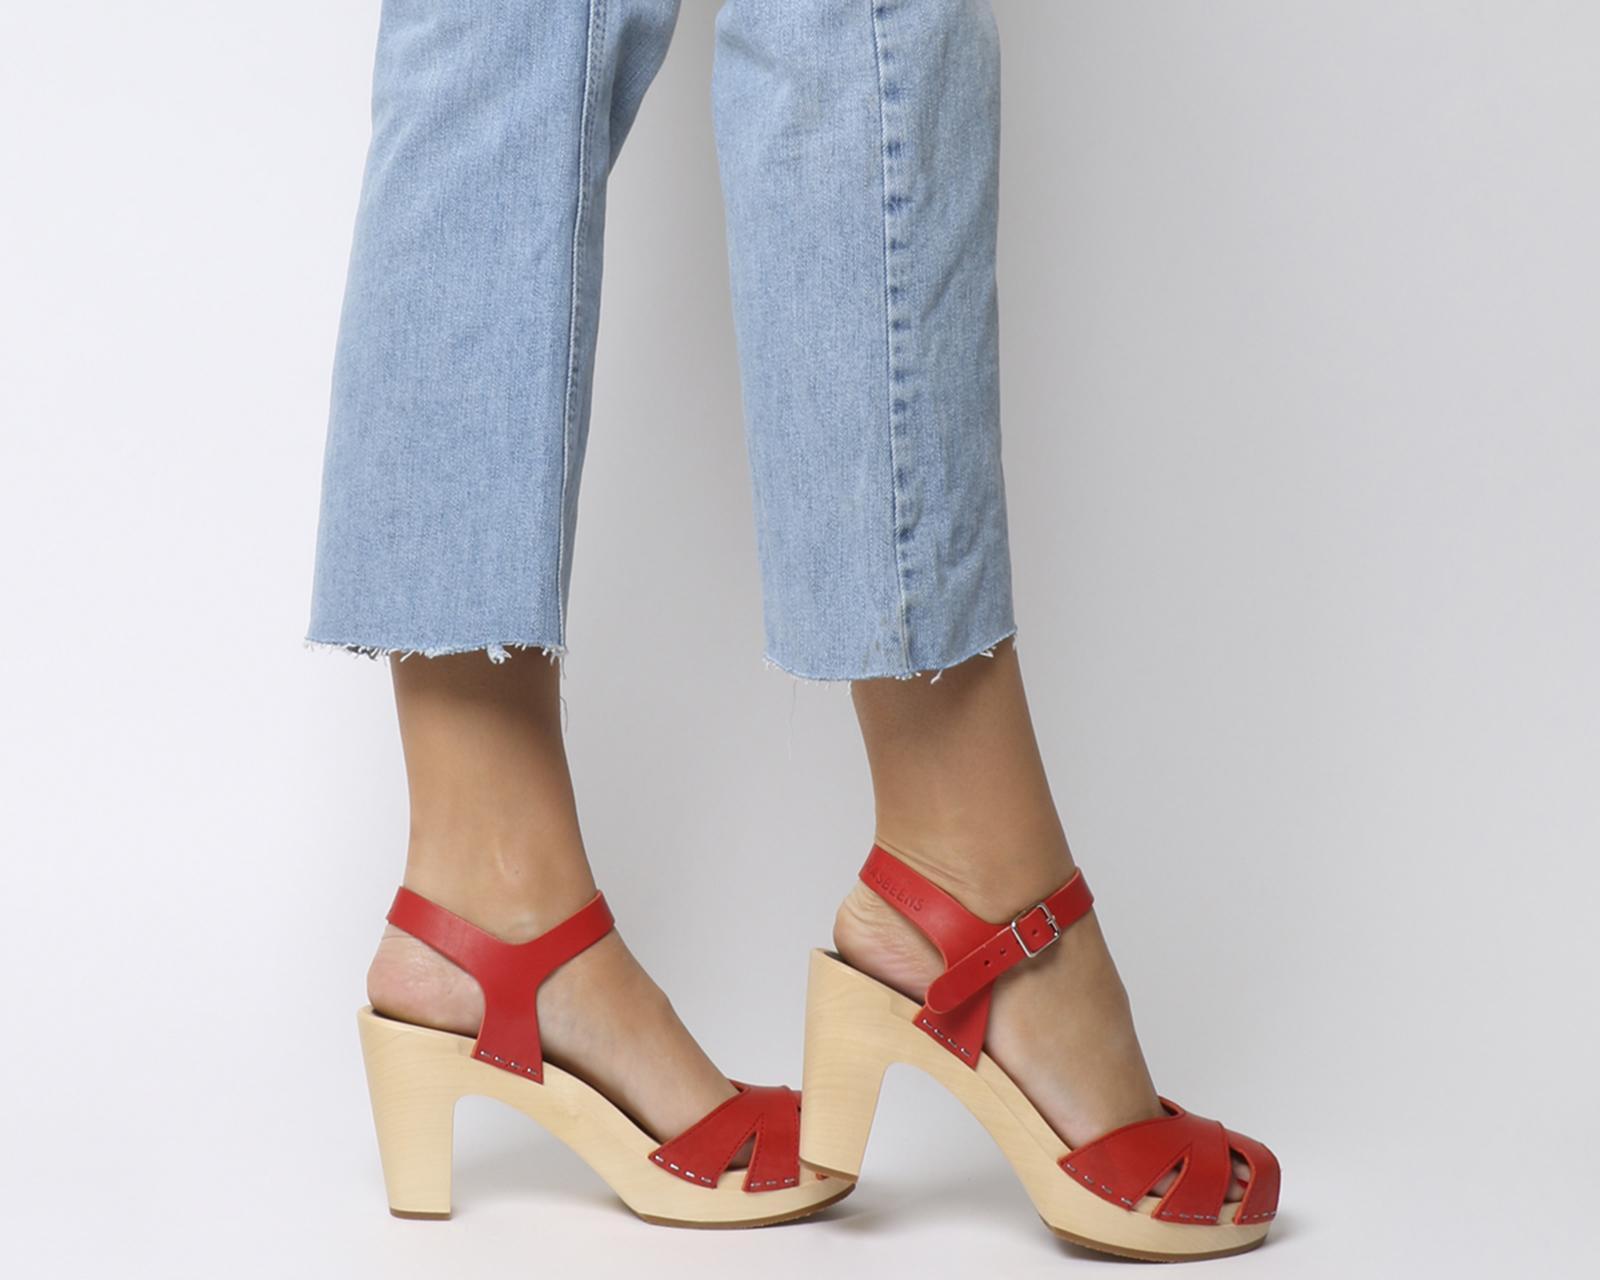 Sentinel Womens Swedish Hasbeens Suzanne Hi Peep Toe Sandals Red Sandals 07e5bc196